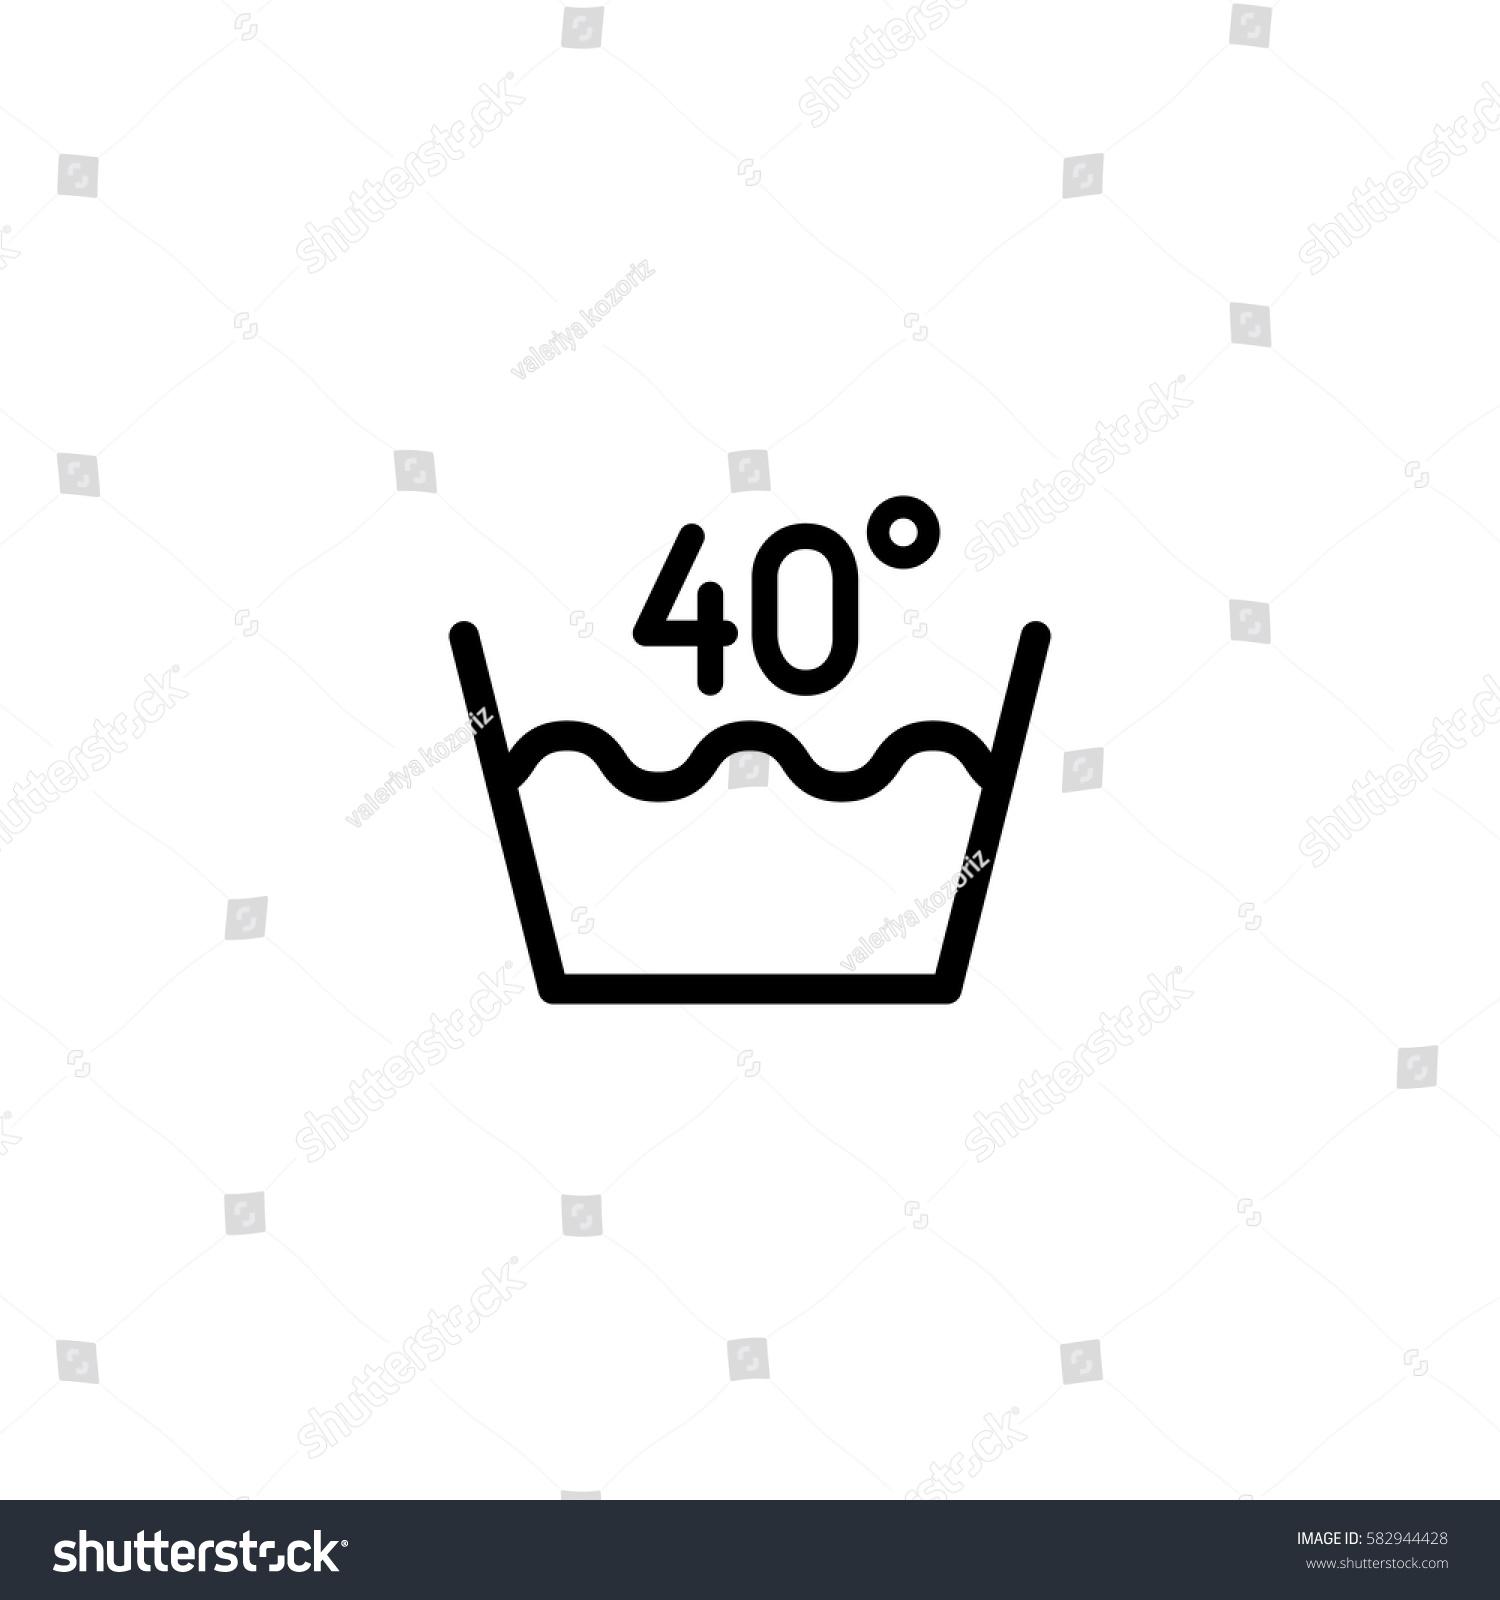 40 Degrees Washing Laundry Symbol Line Stock Photo Photo Vector